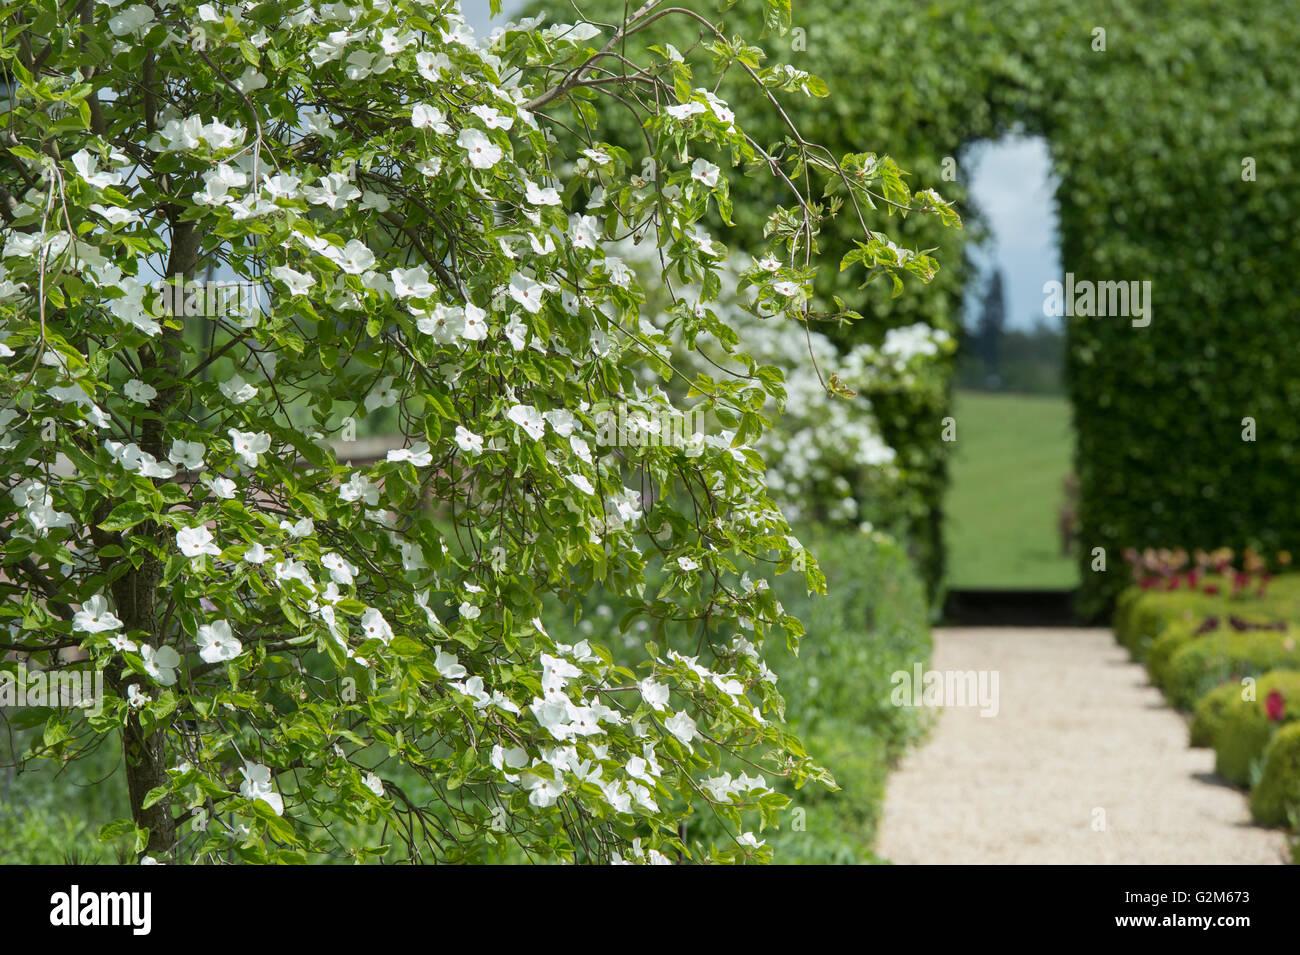 Cornus Kousa chinensis. Japanese Flowering Dogwood tree in Broughton Grange gardens, Oxfordshire, England - Stock Image